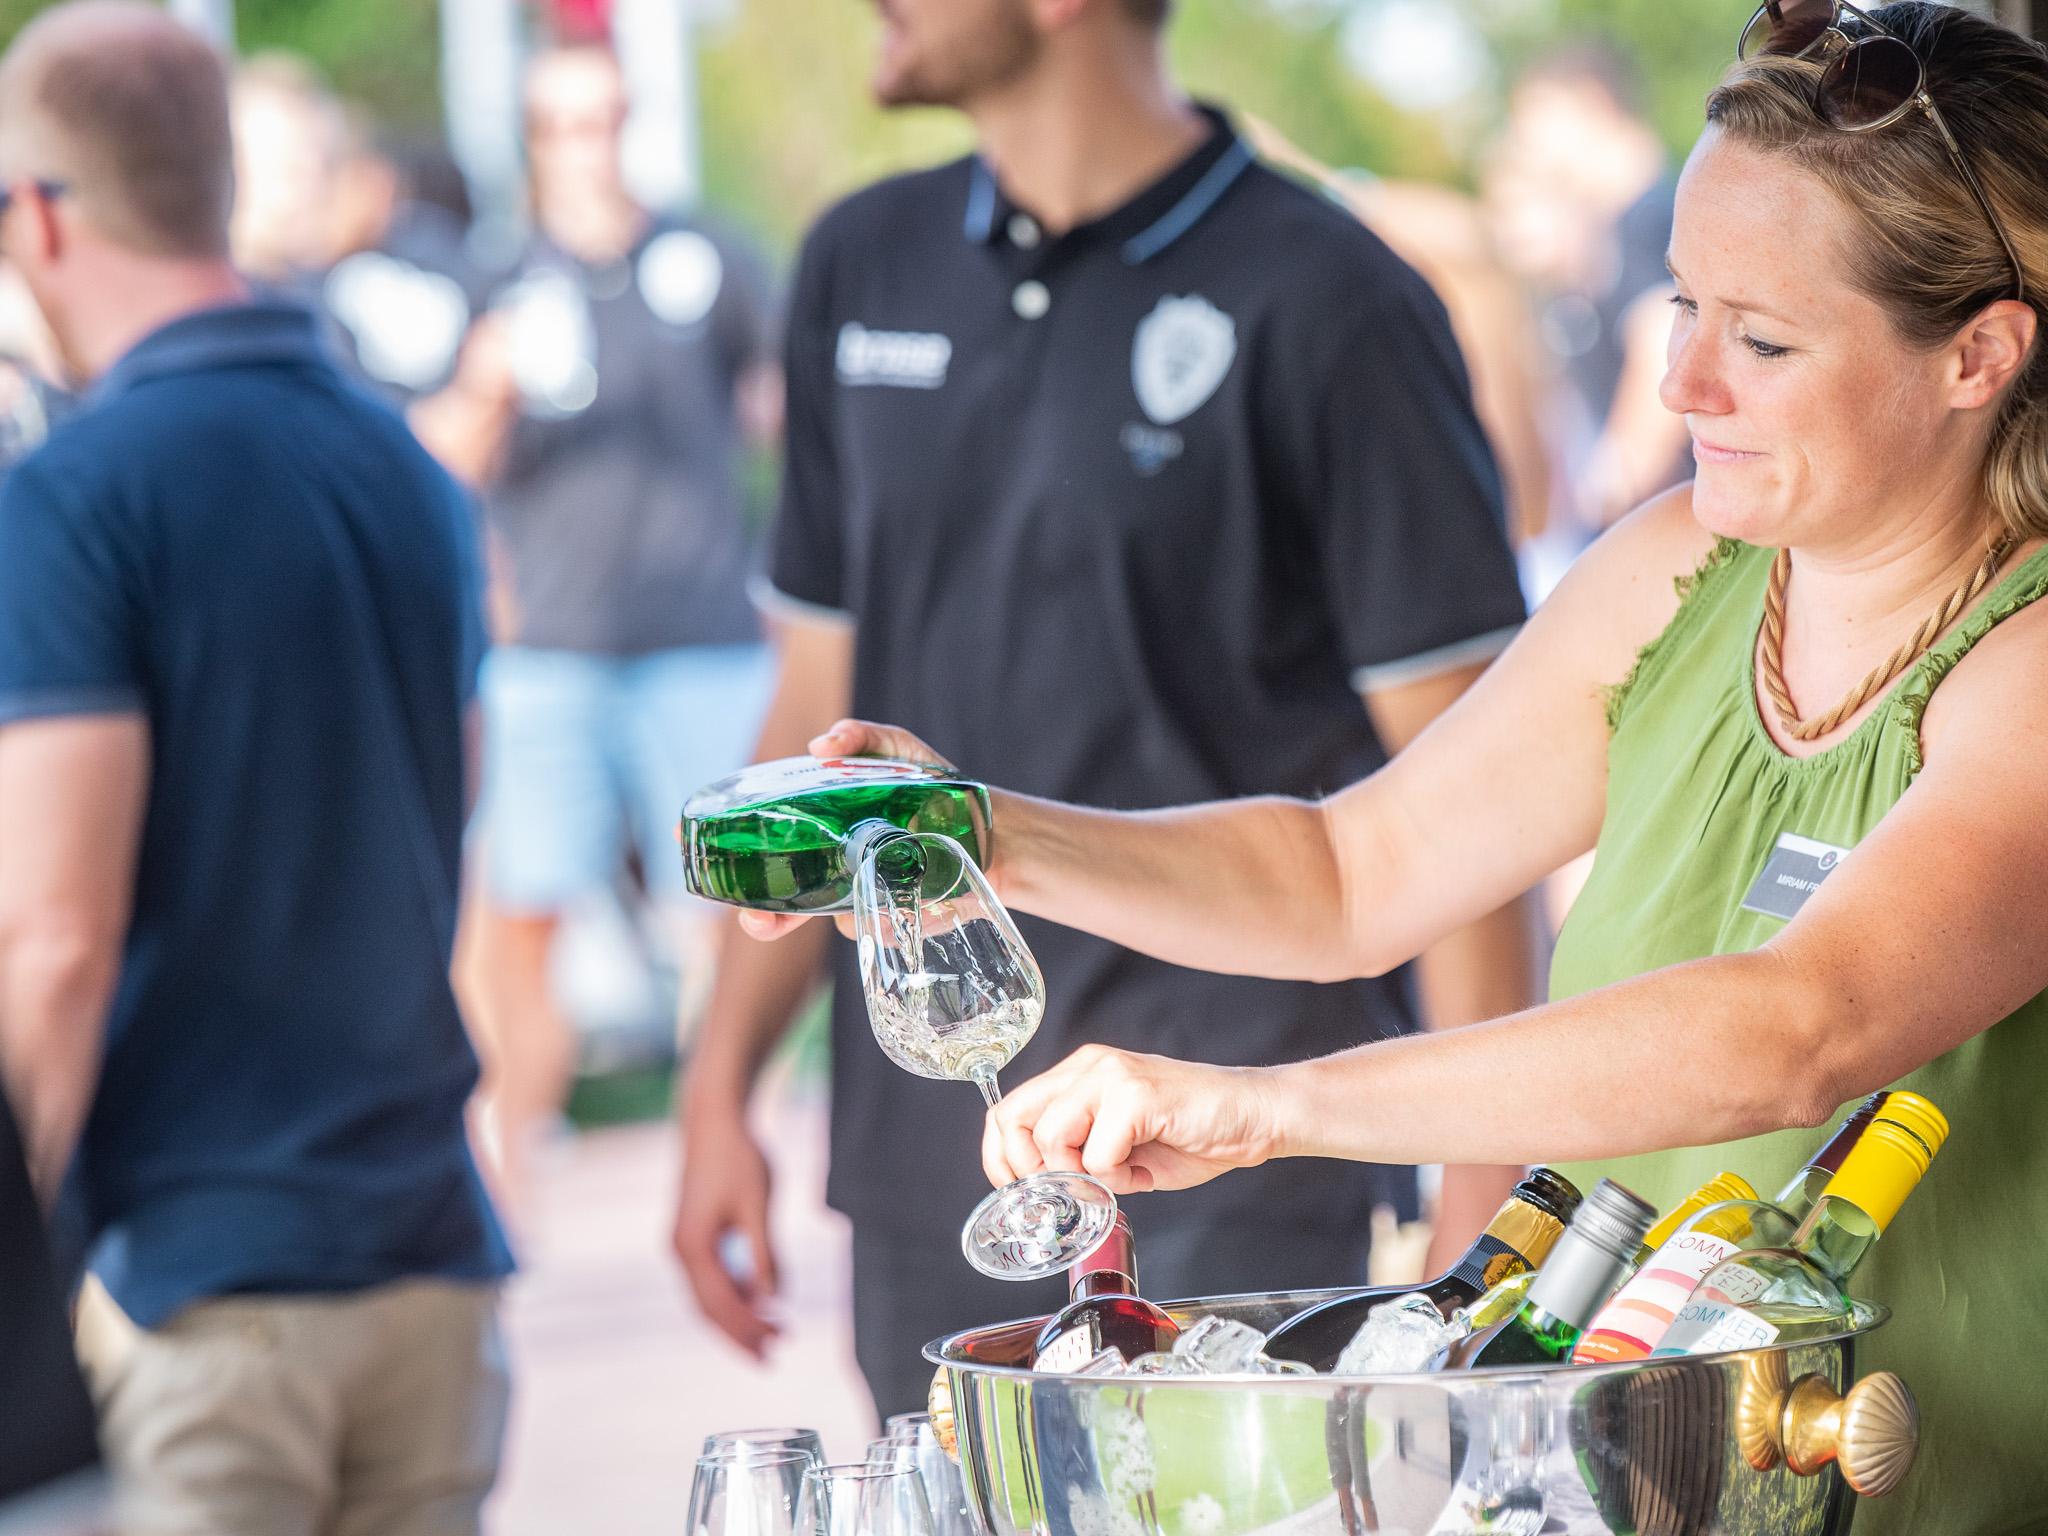 Leckerer Frankenwein zum Golfen. Foto: Pascal Höfig